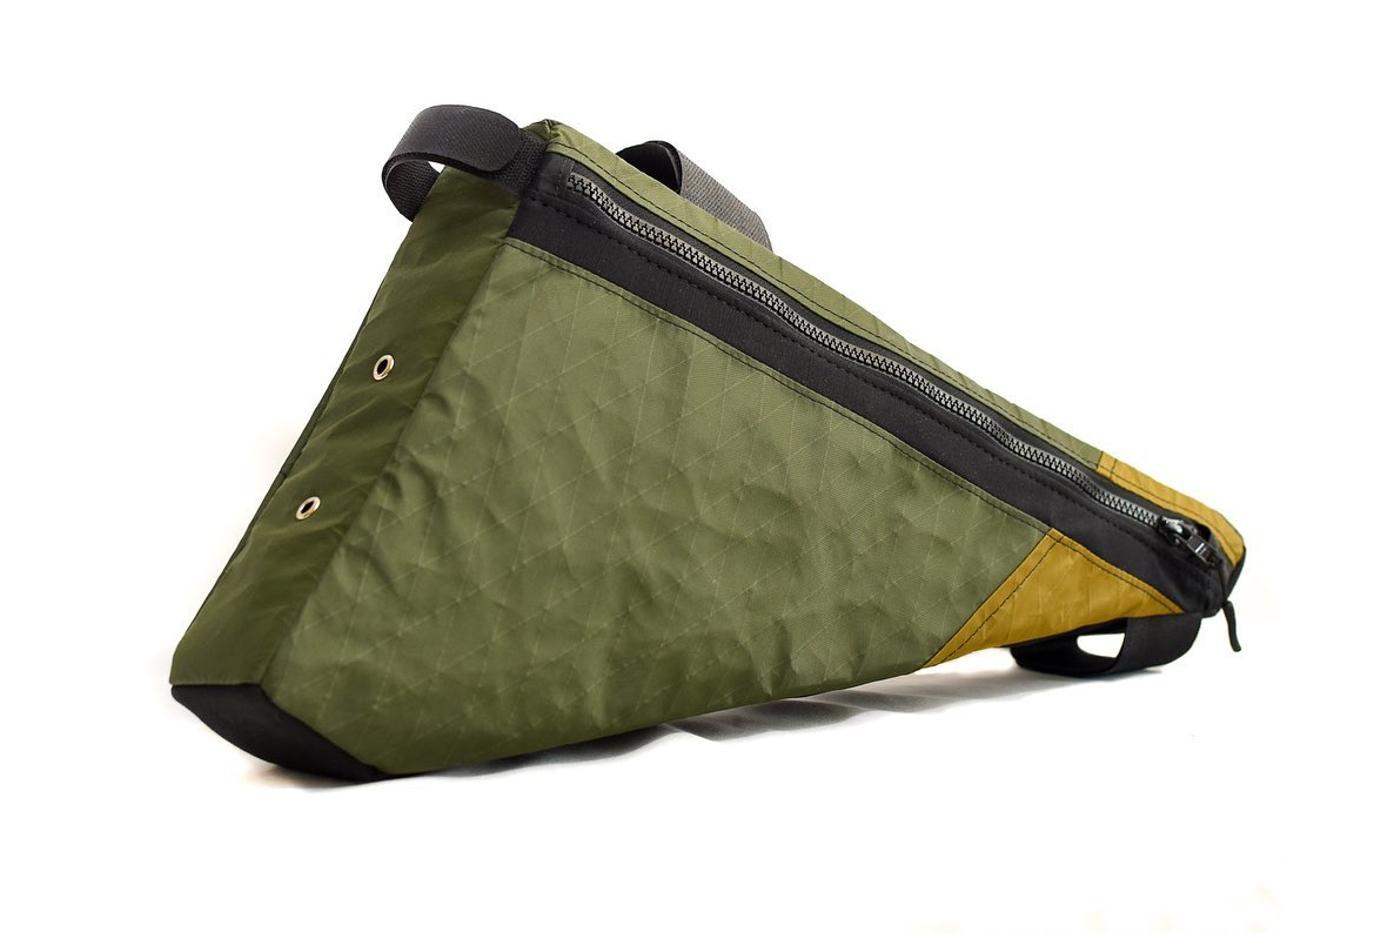 Buckhorn Bags Makes Custom Bags and More in Albuquerque